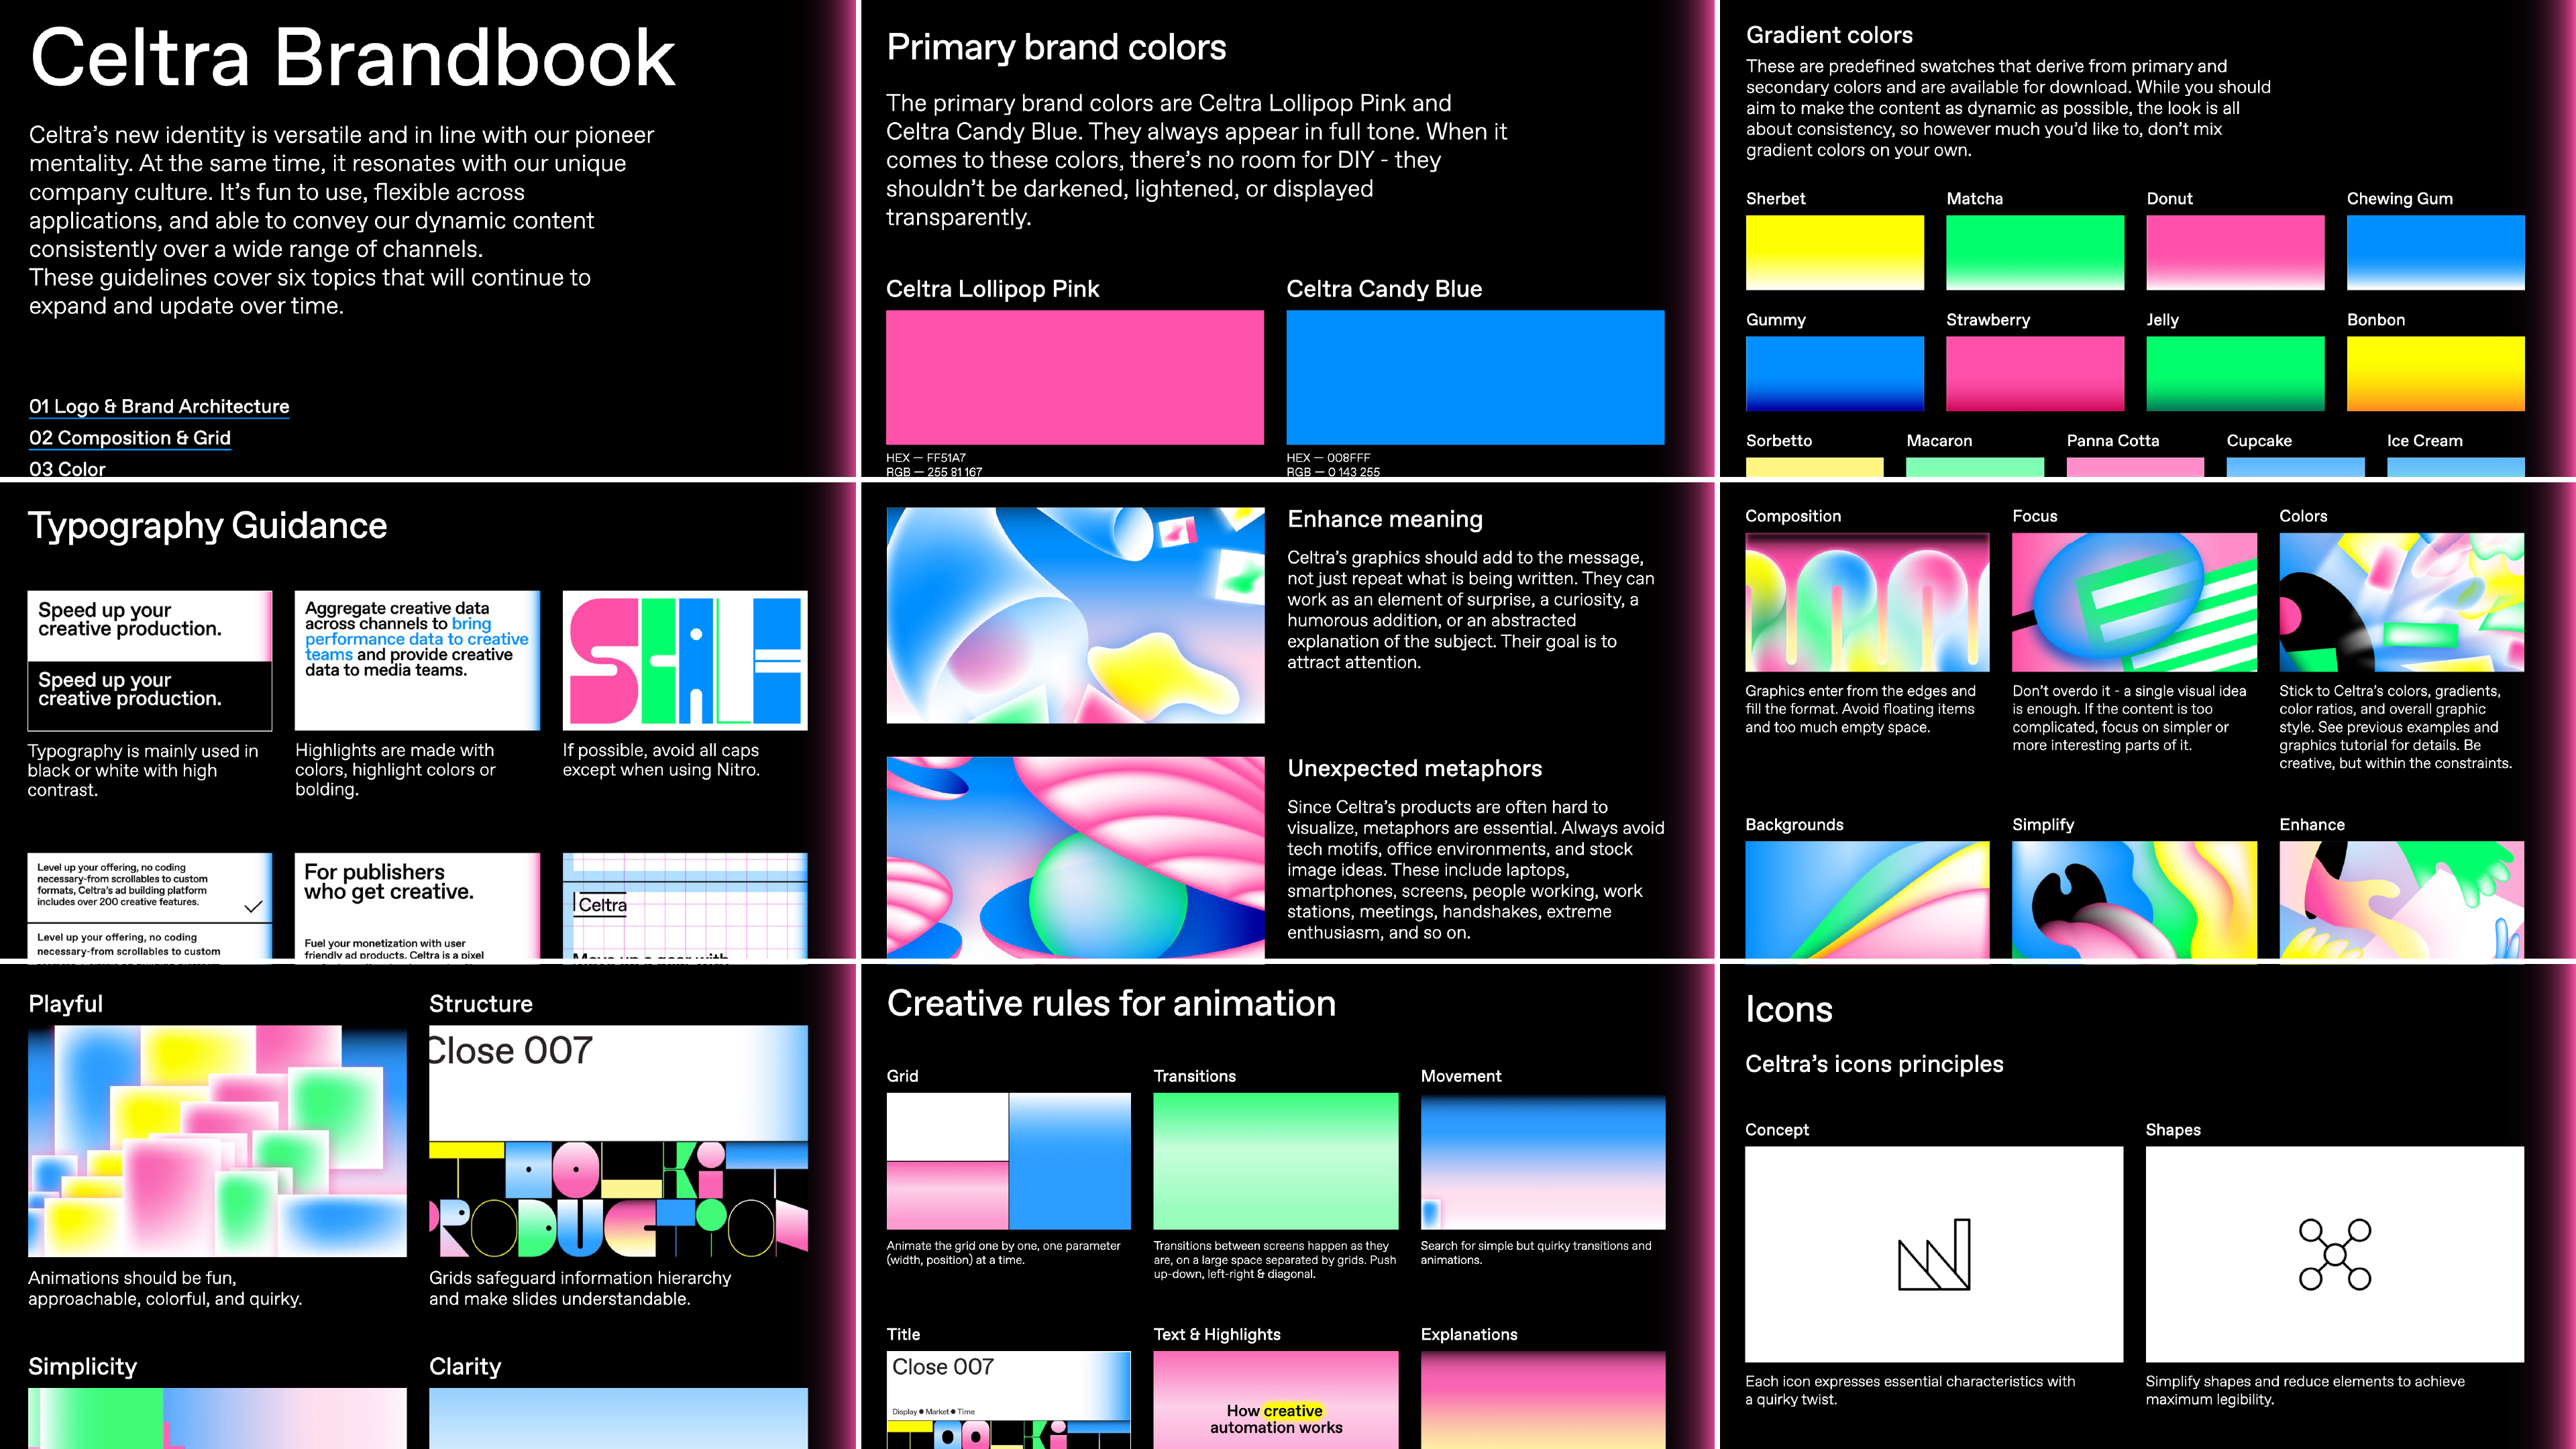 Online brandbook designed for Celtra.